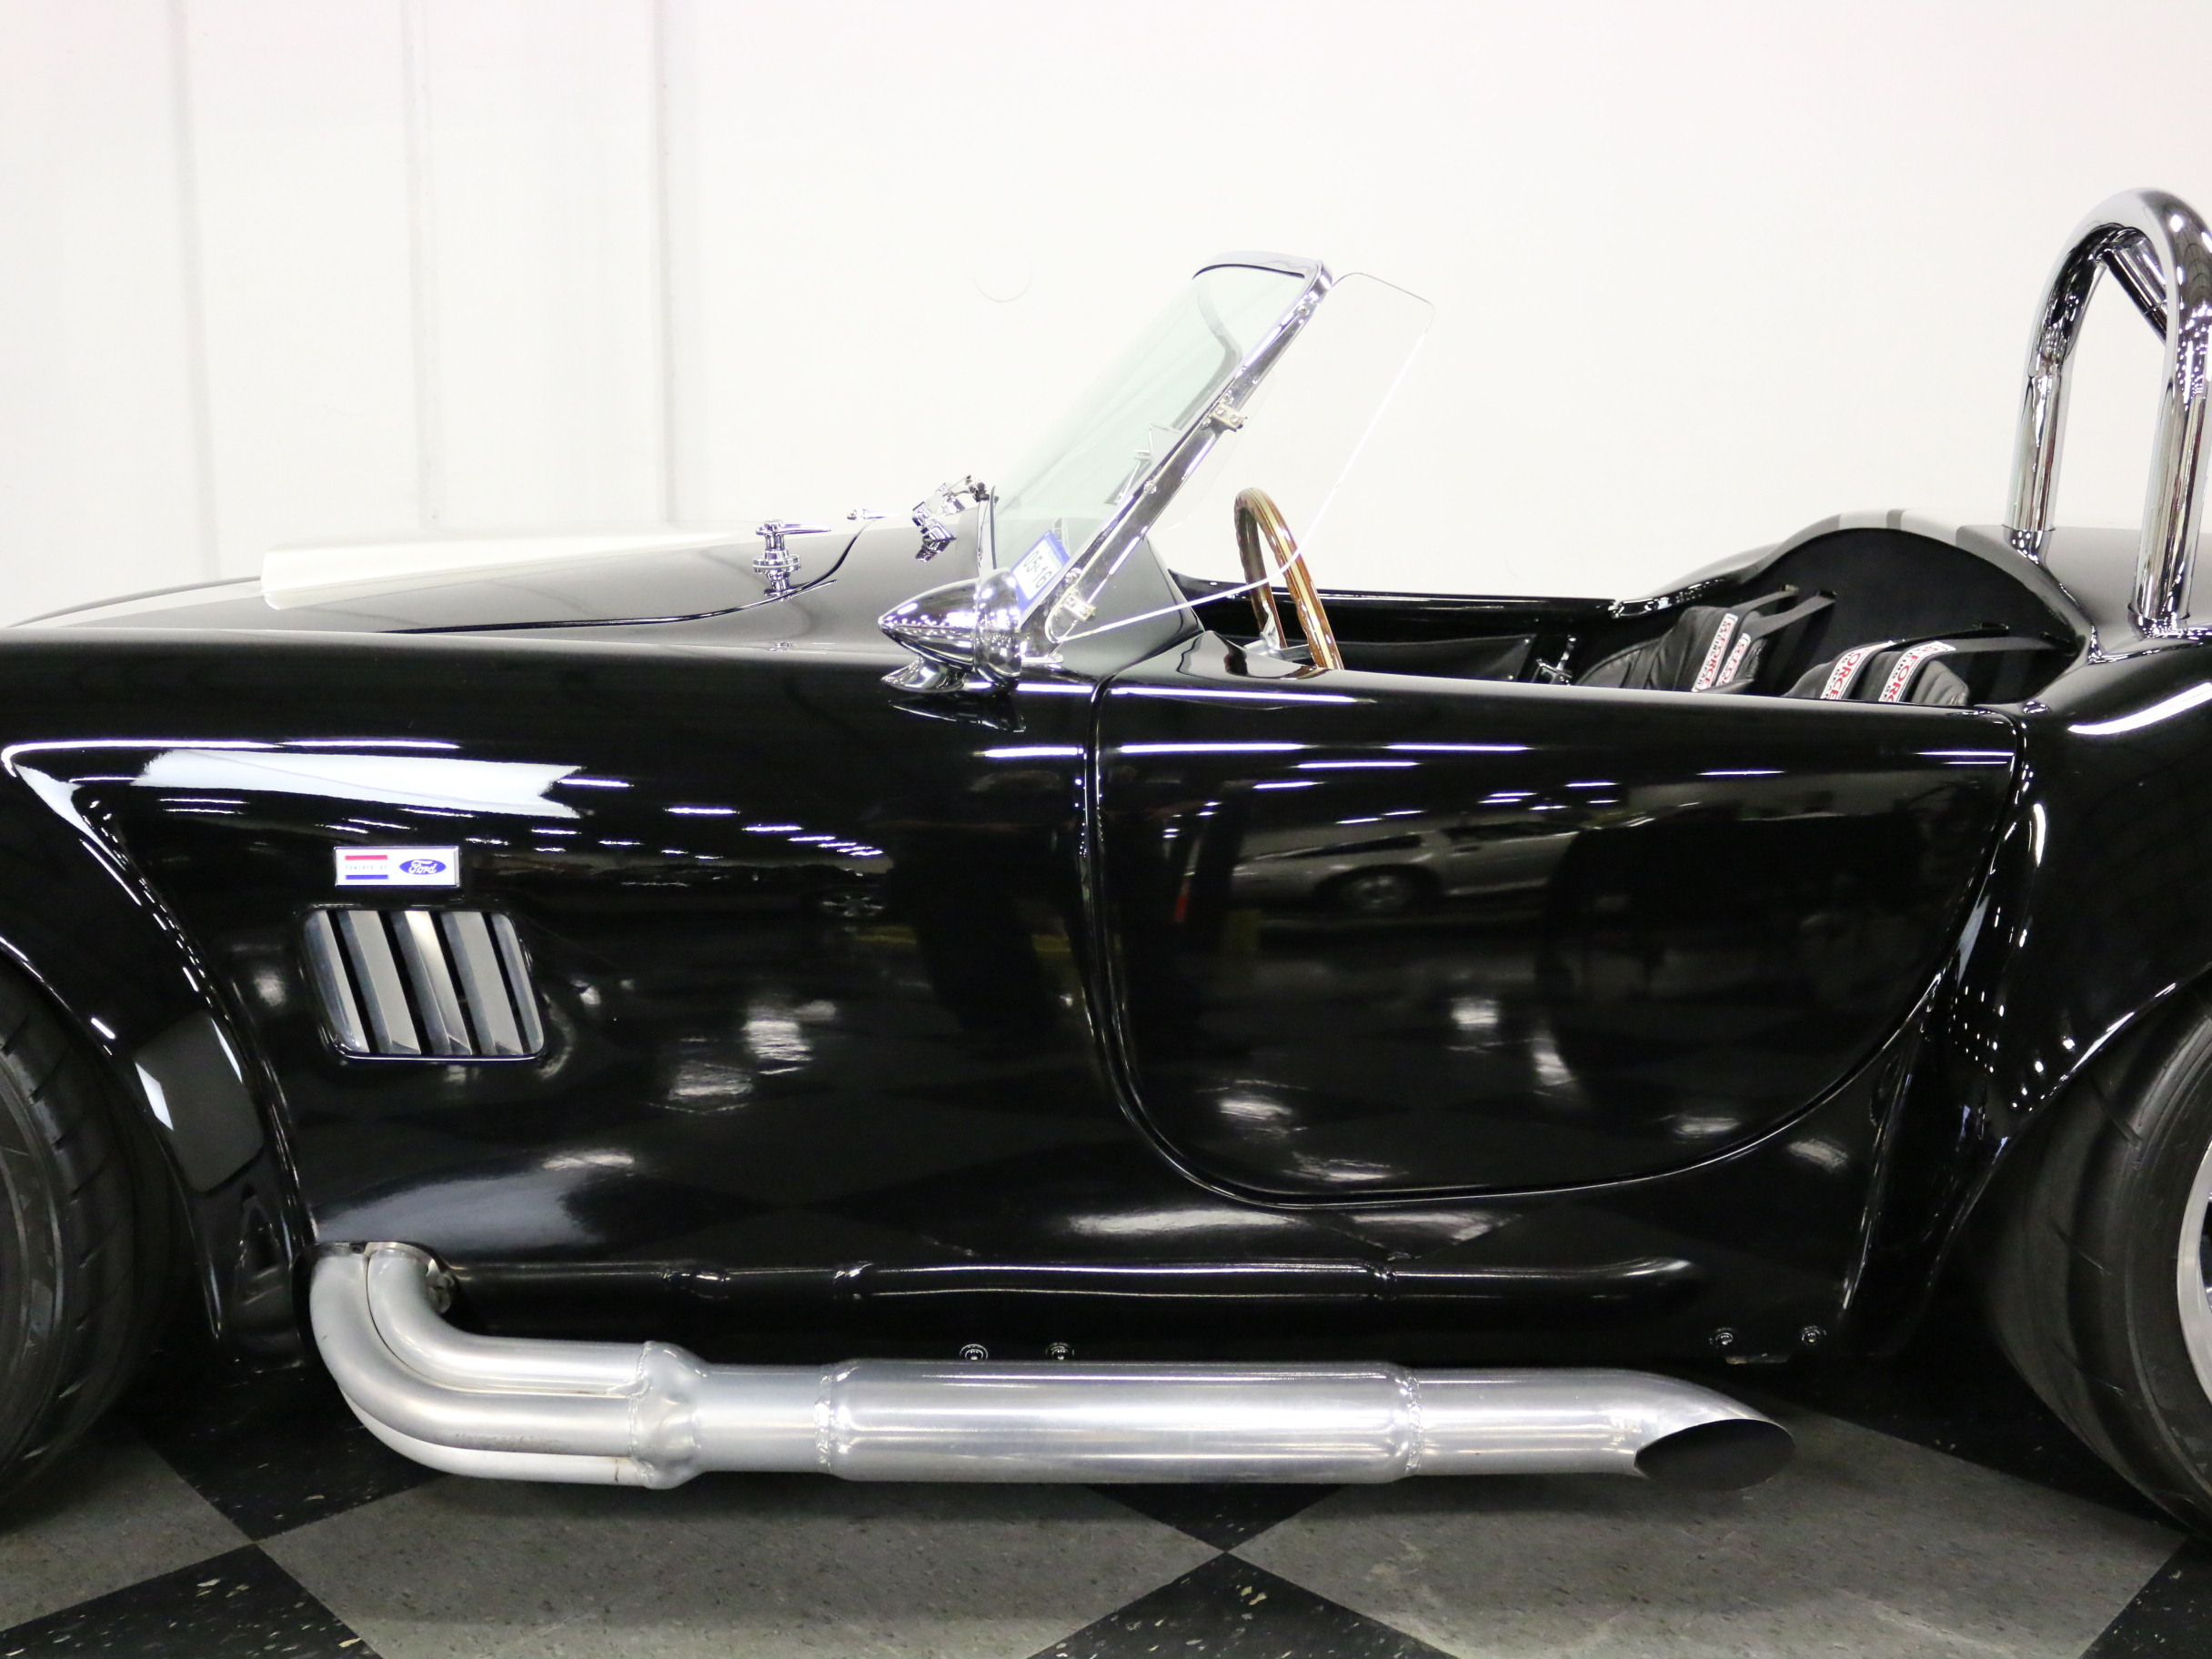 1965 Shelby Cobra Replica | eBay